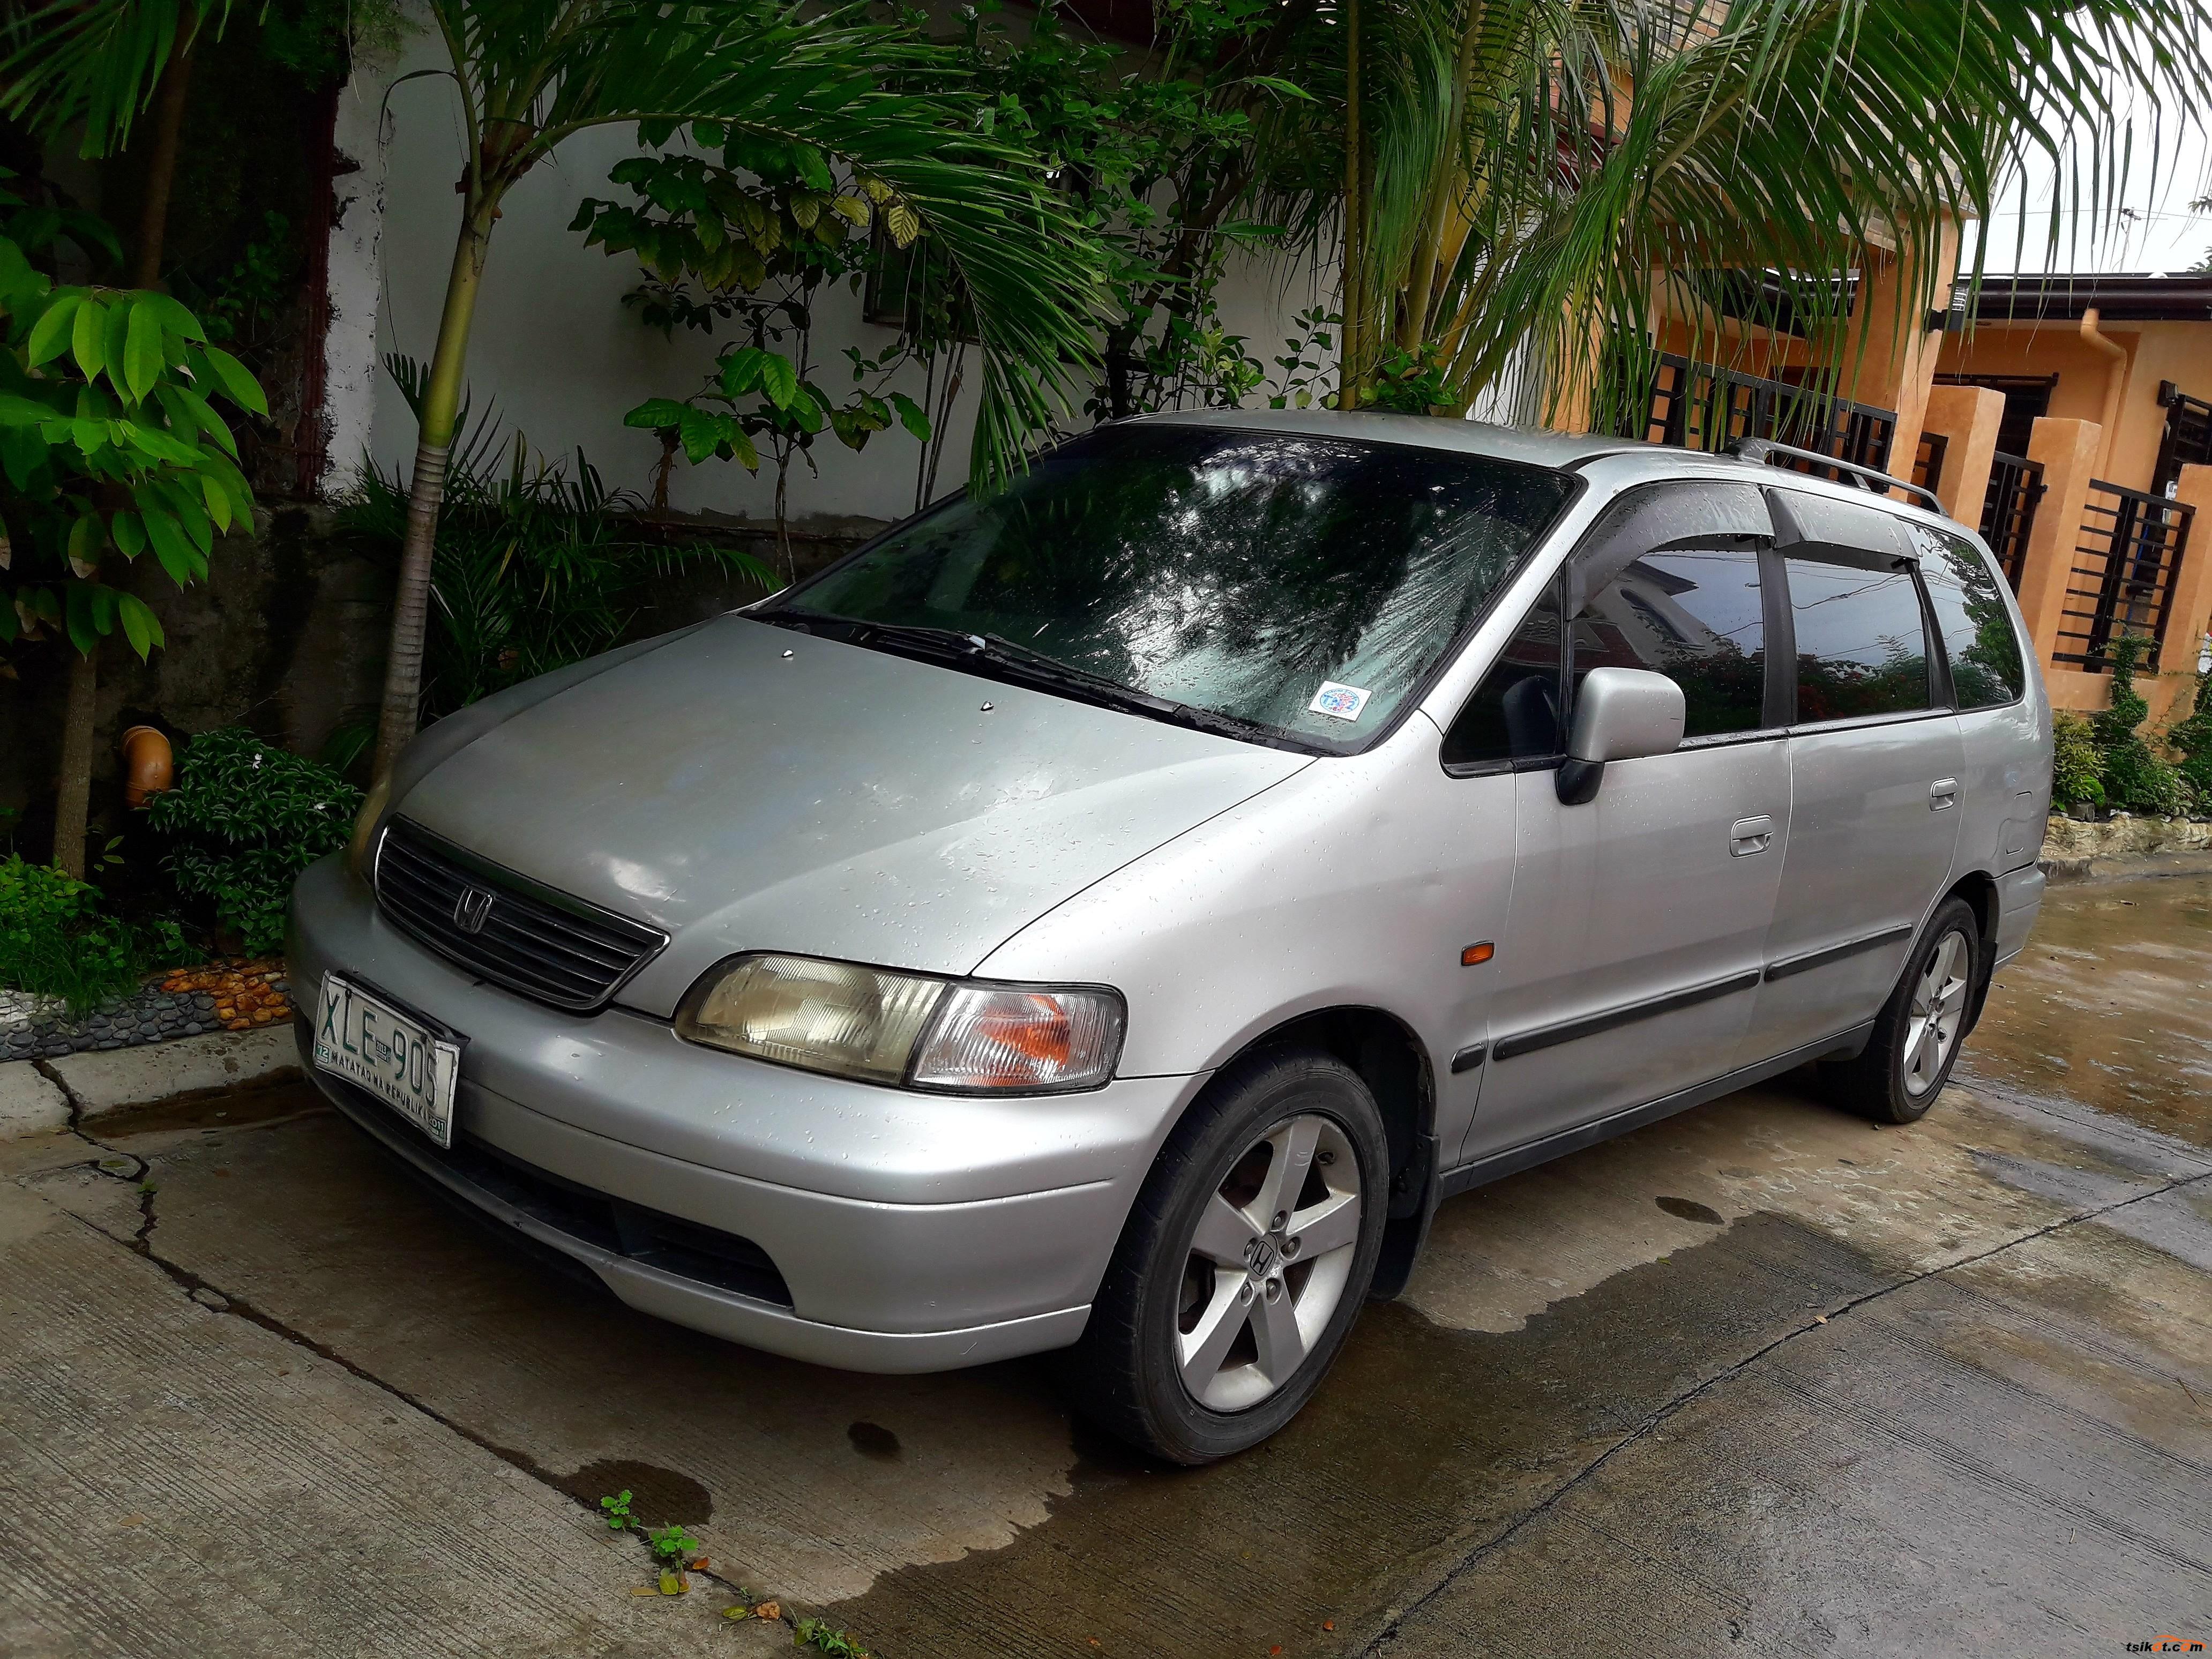 Honda Odyssey 2004 - Car for Sale Metro Manila